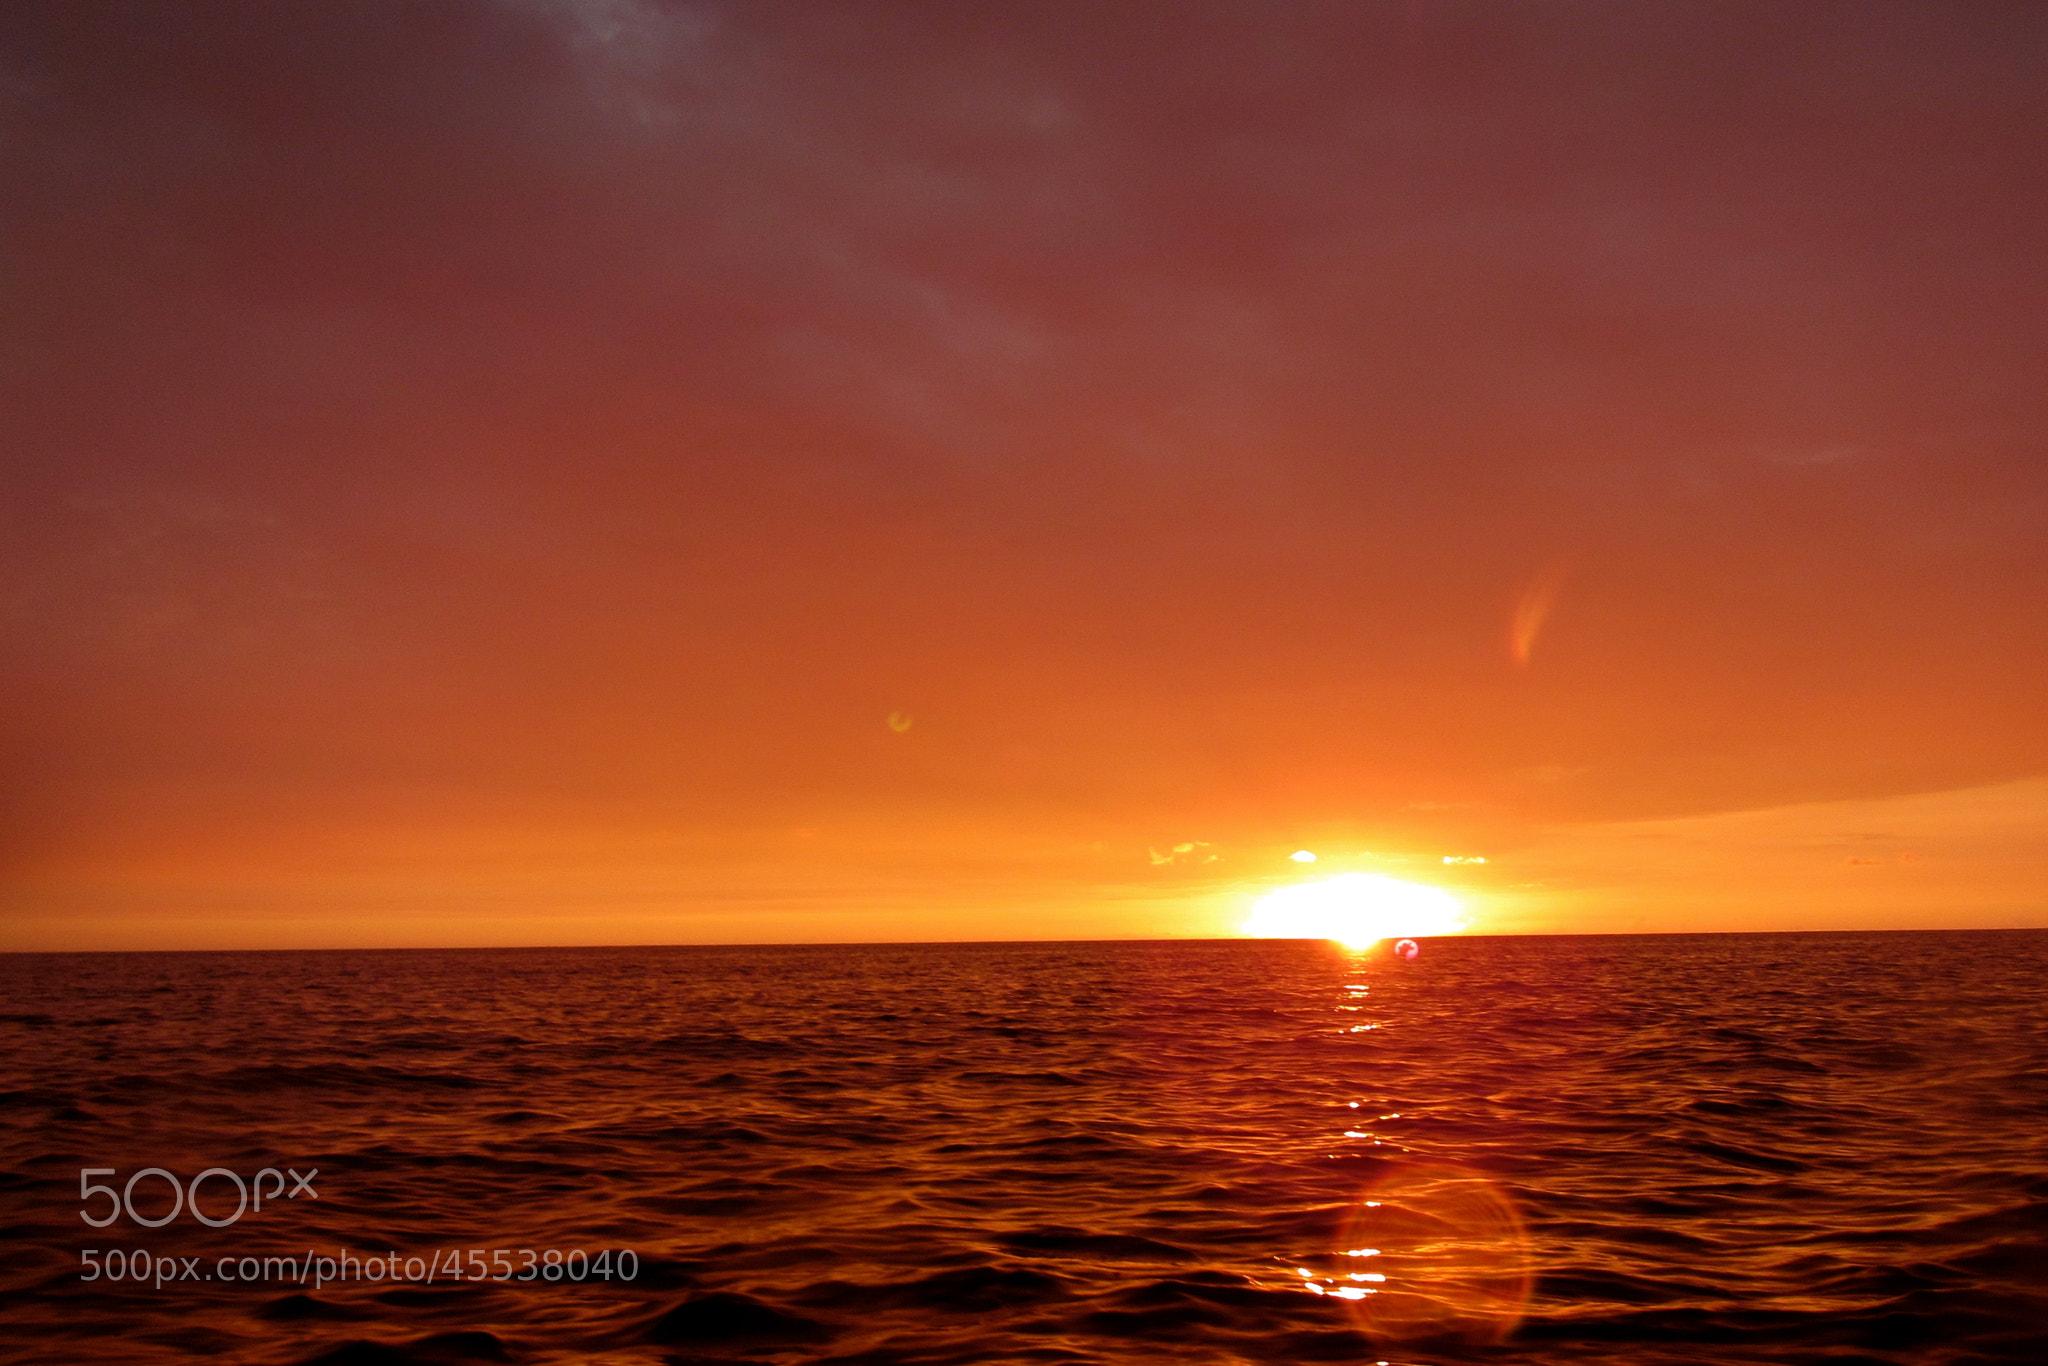 Photograph kayaking at sunset by Vishnu MR on 500px